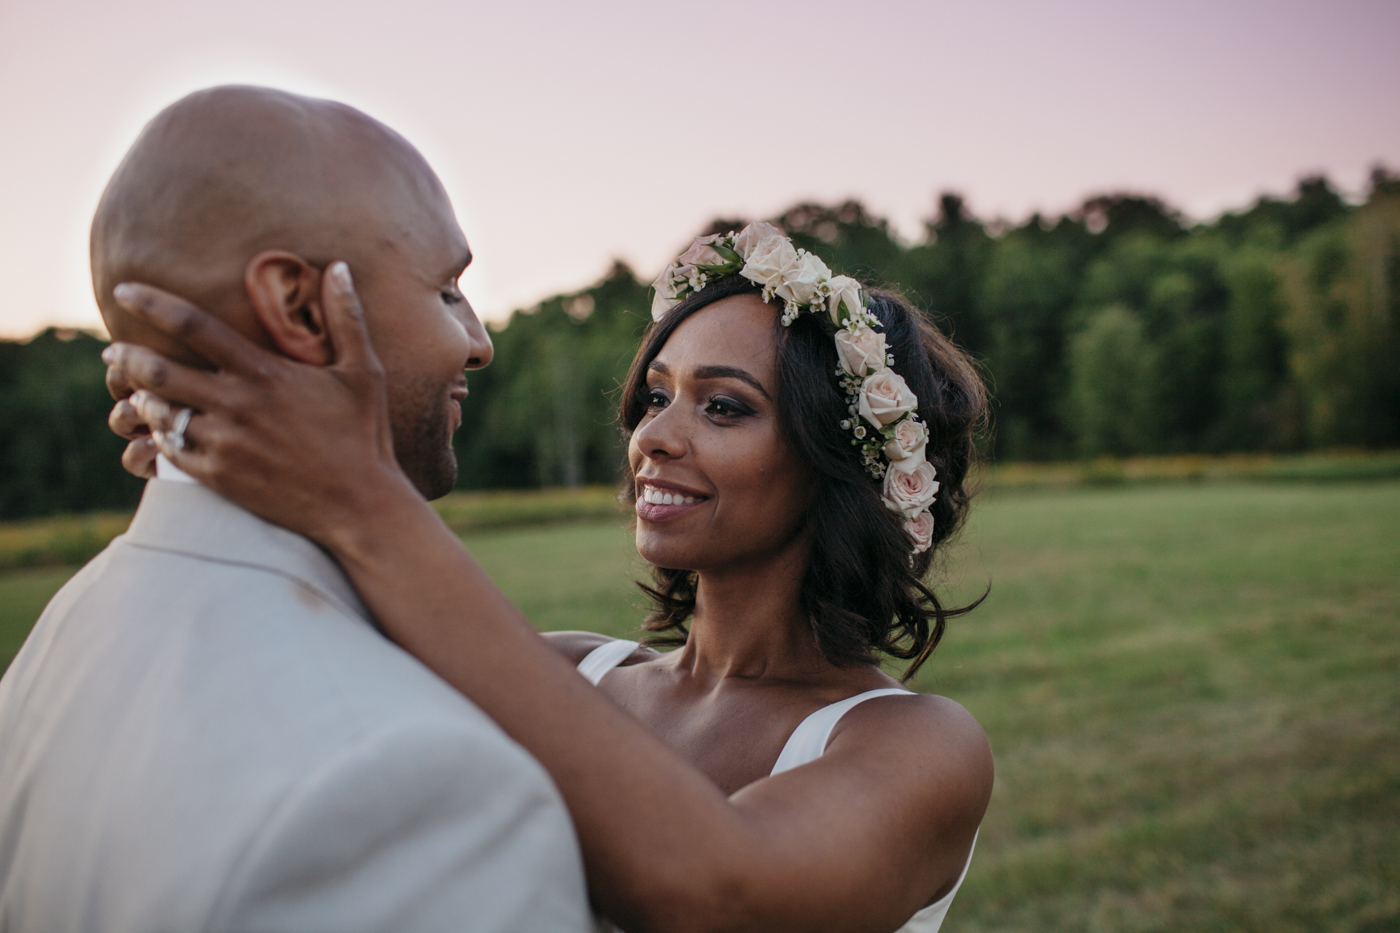 Toni_Earl_Rest_and_Be_Thankful_farm_wedding_maine_025.jpg